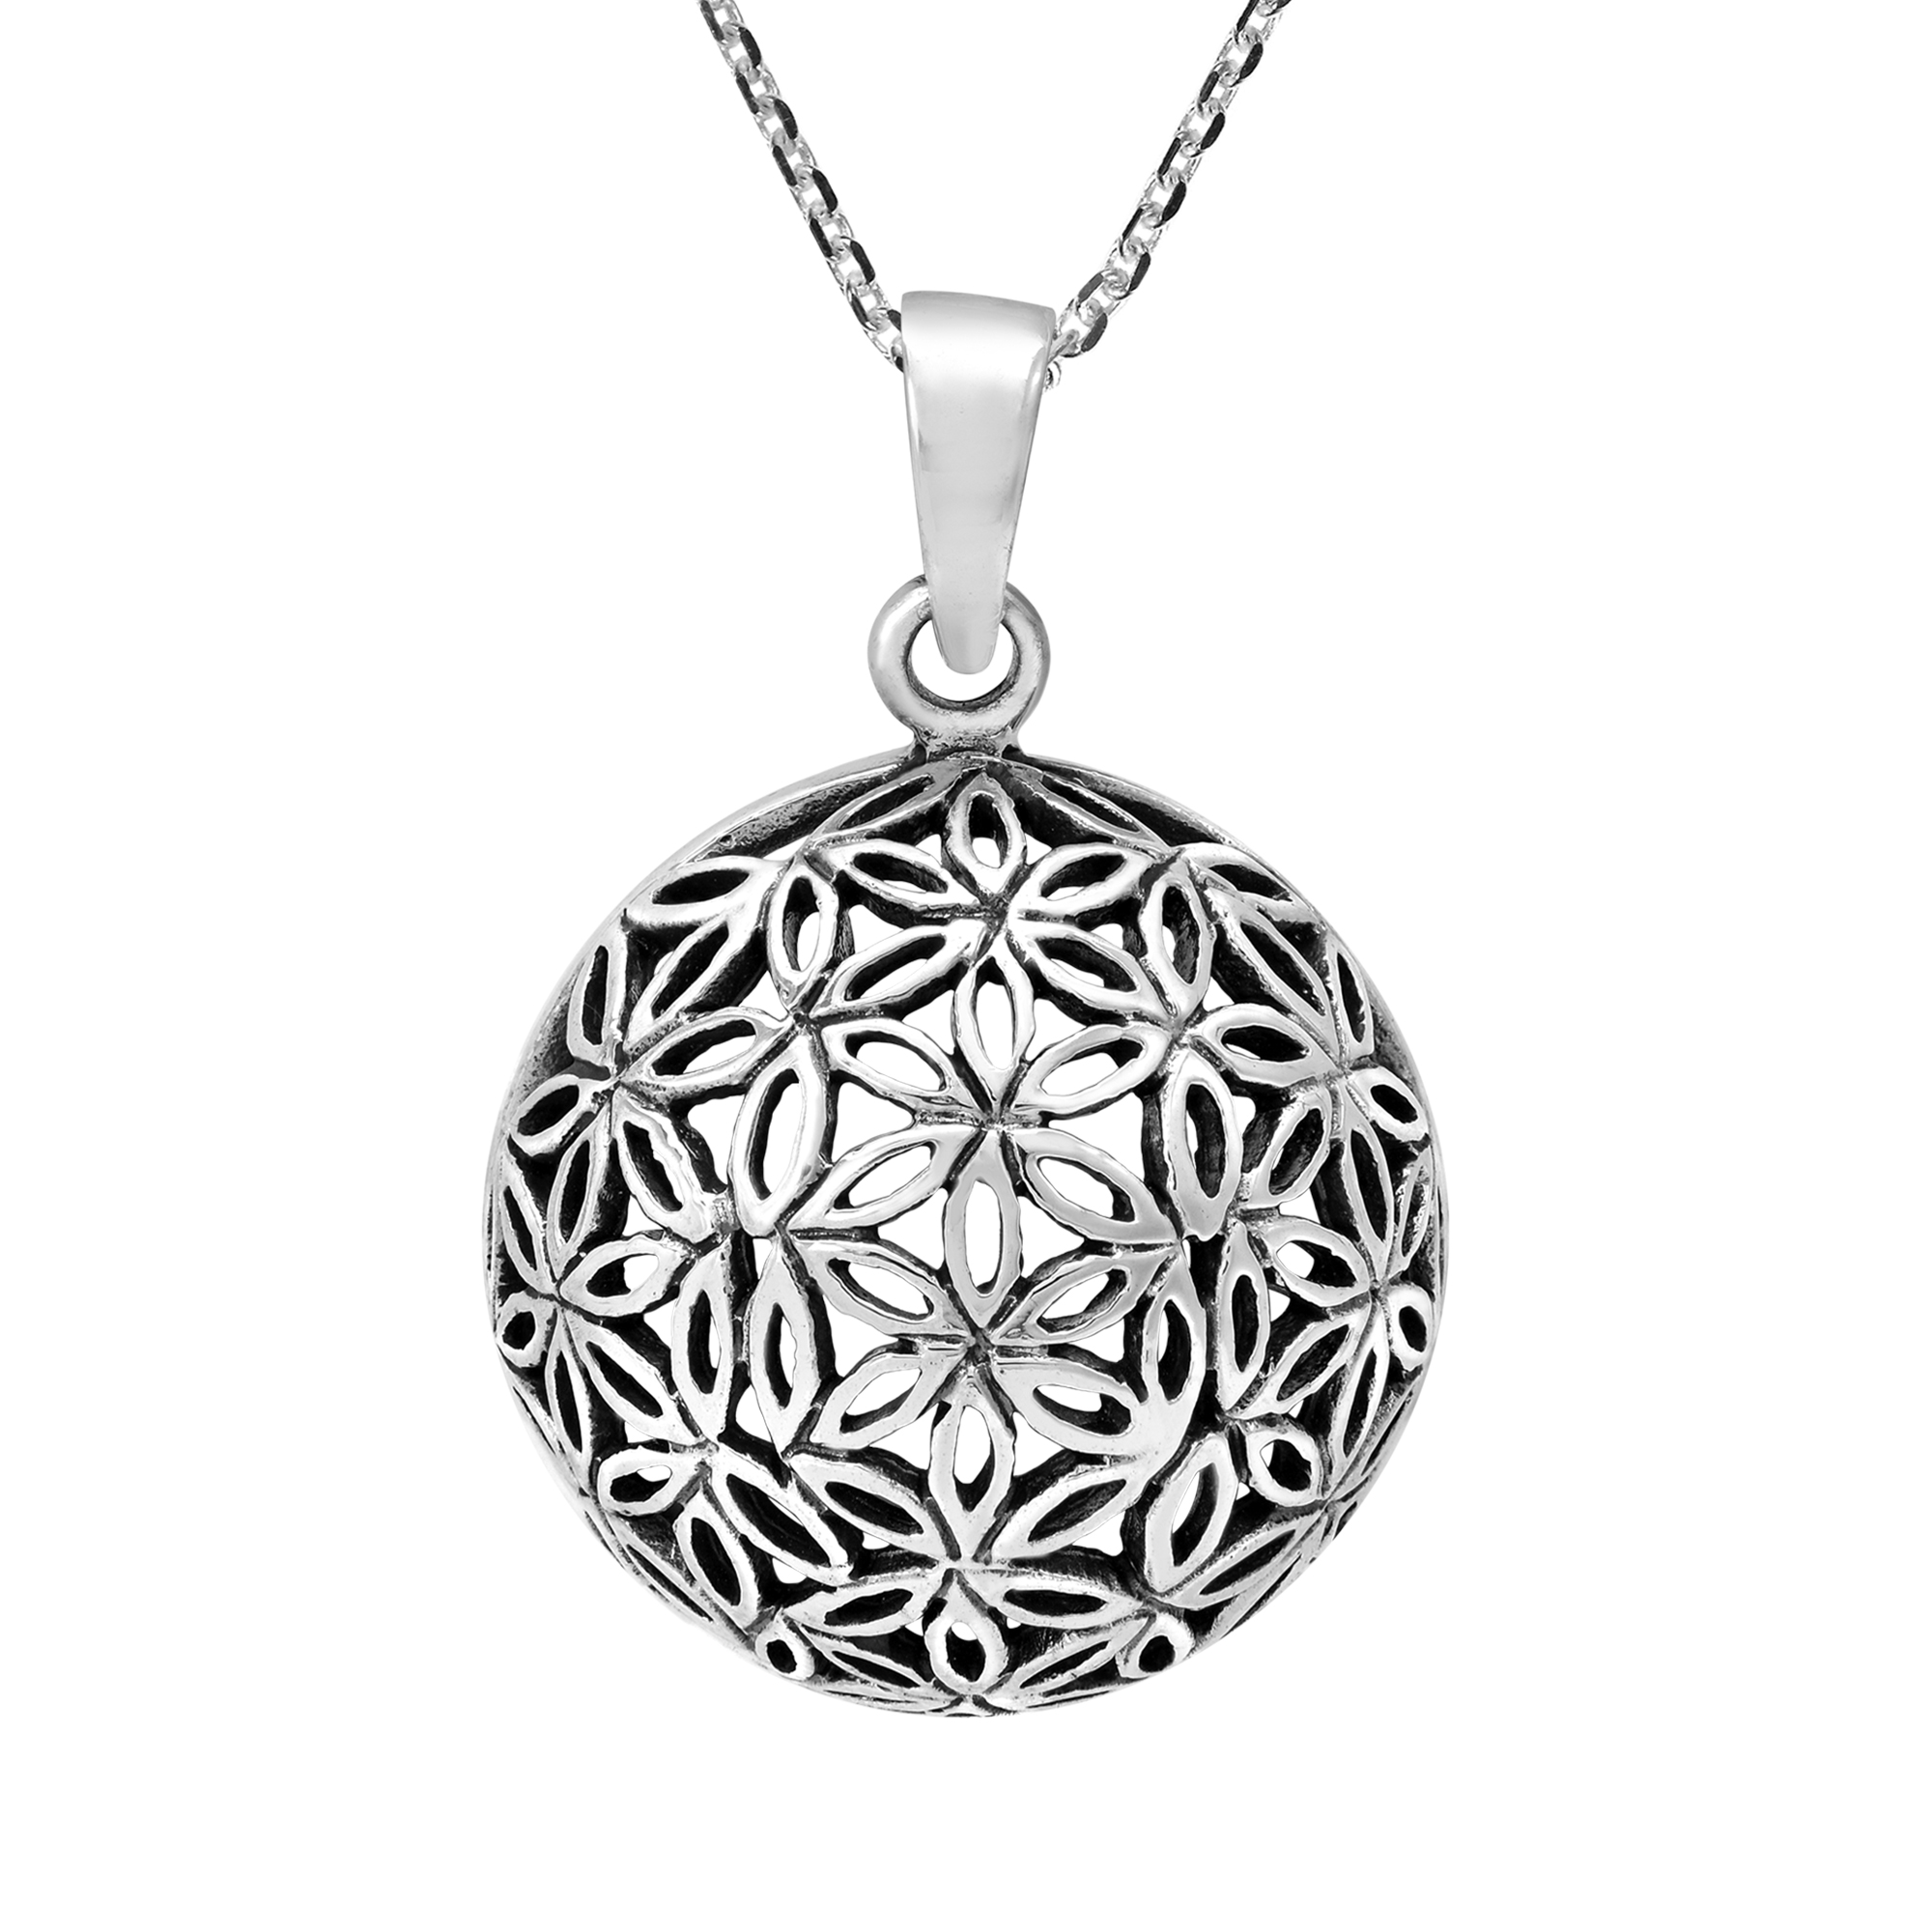 Snowflake Flower Sunburst .925 Sterling Silver Pendant Necklace